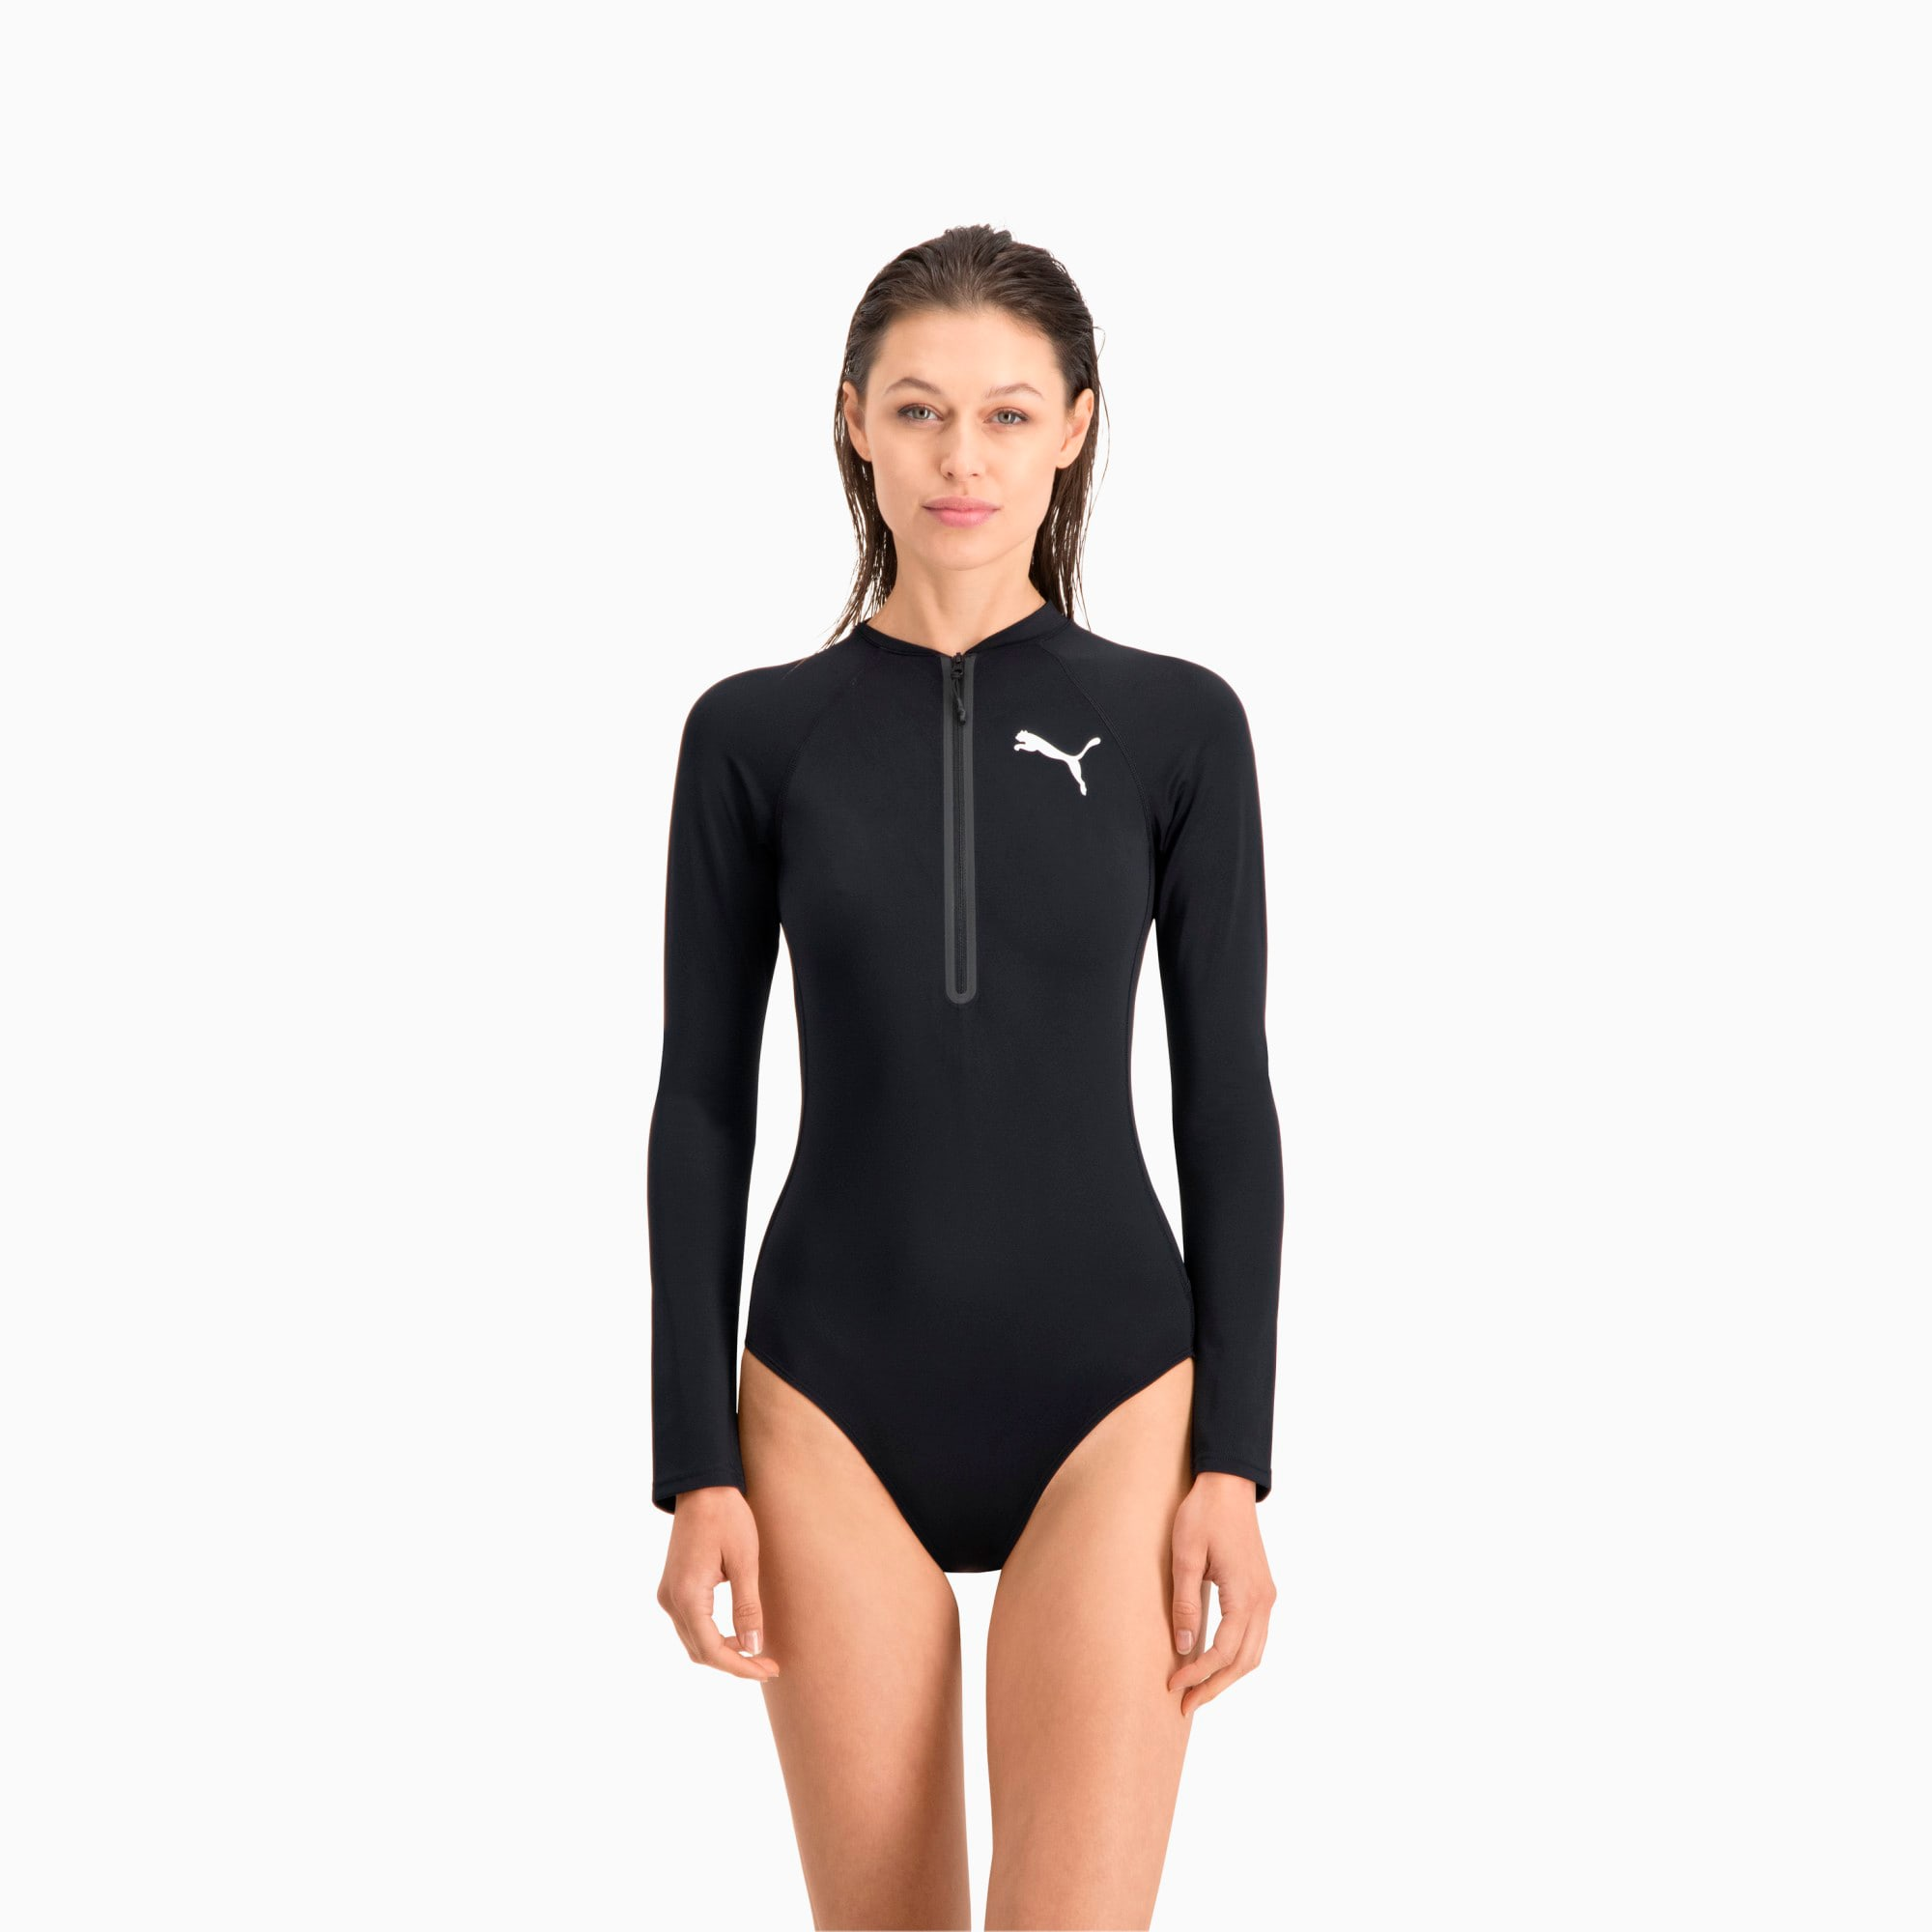 PUMA Swim Women's Long Sleeve Surf Suit